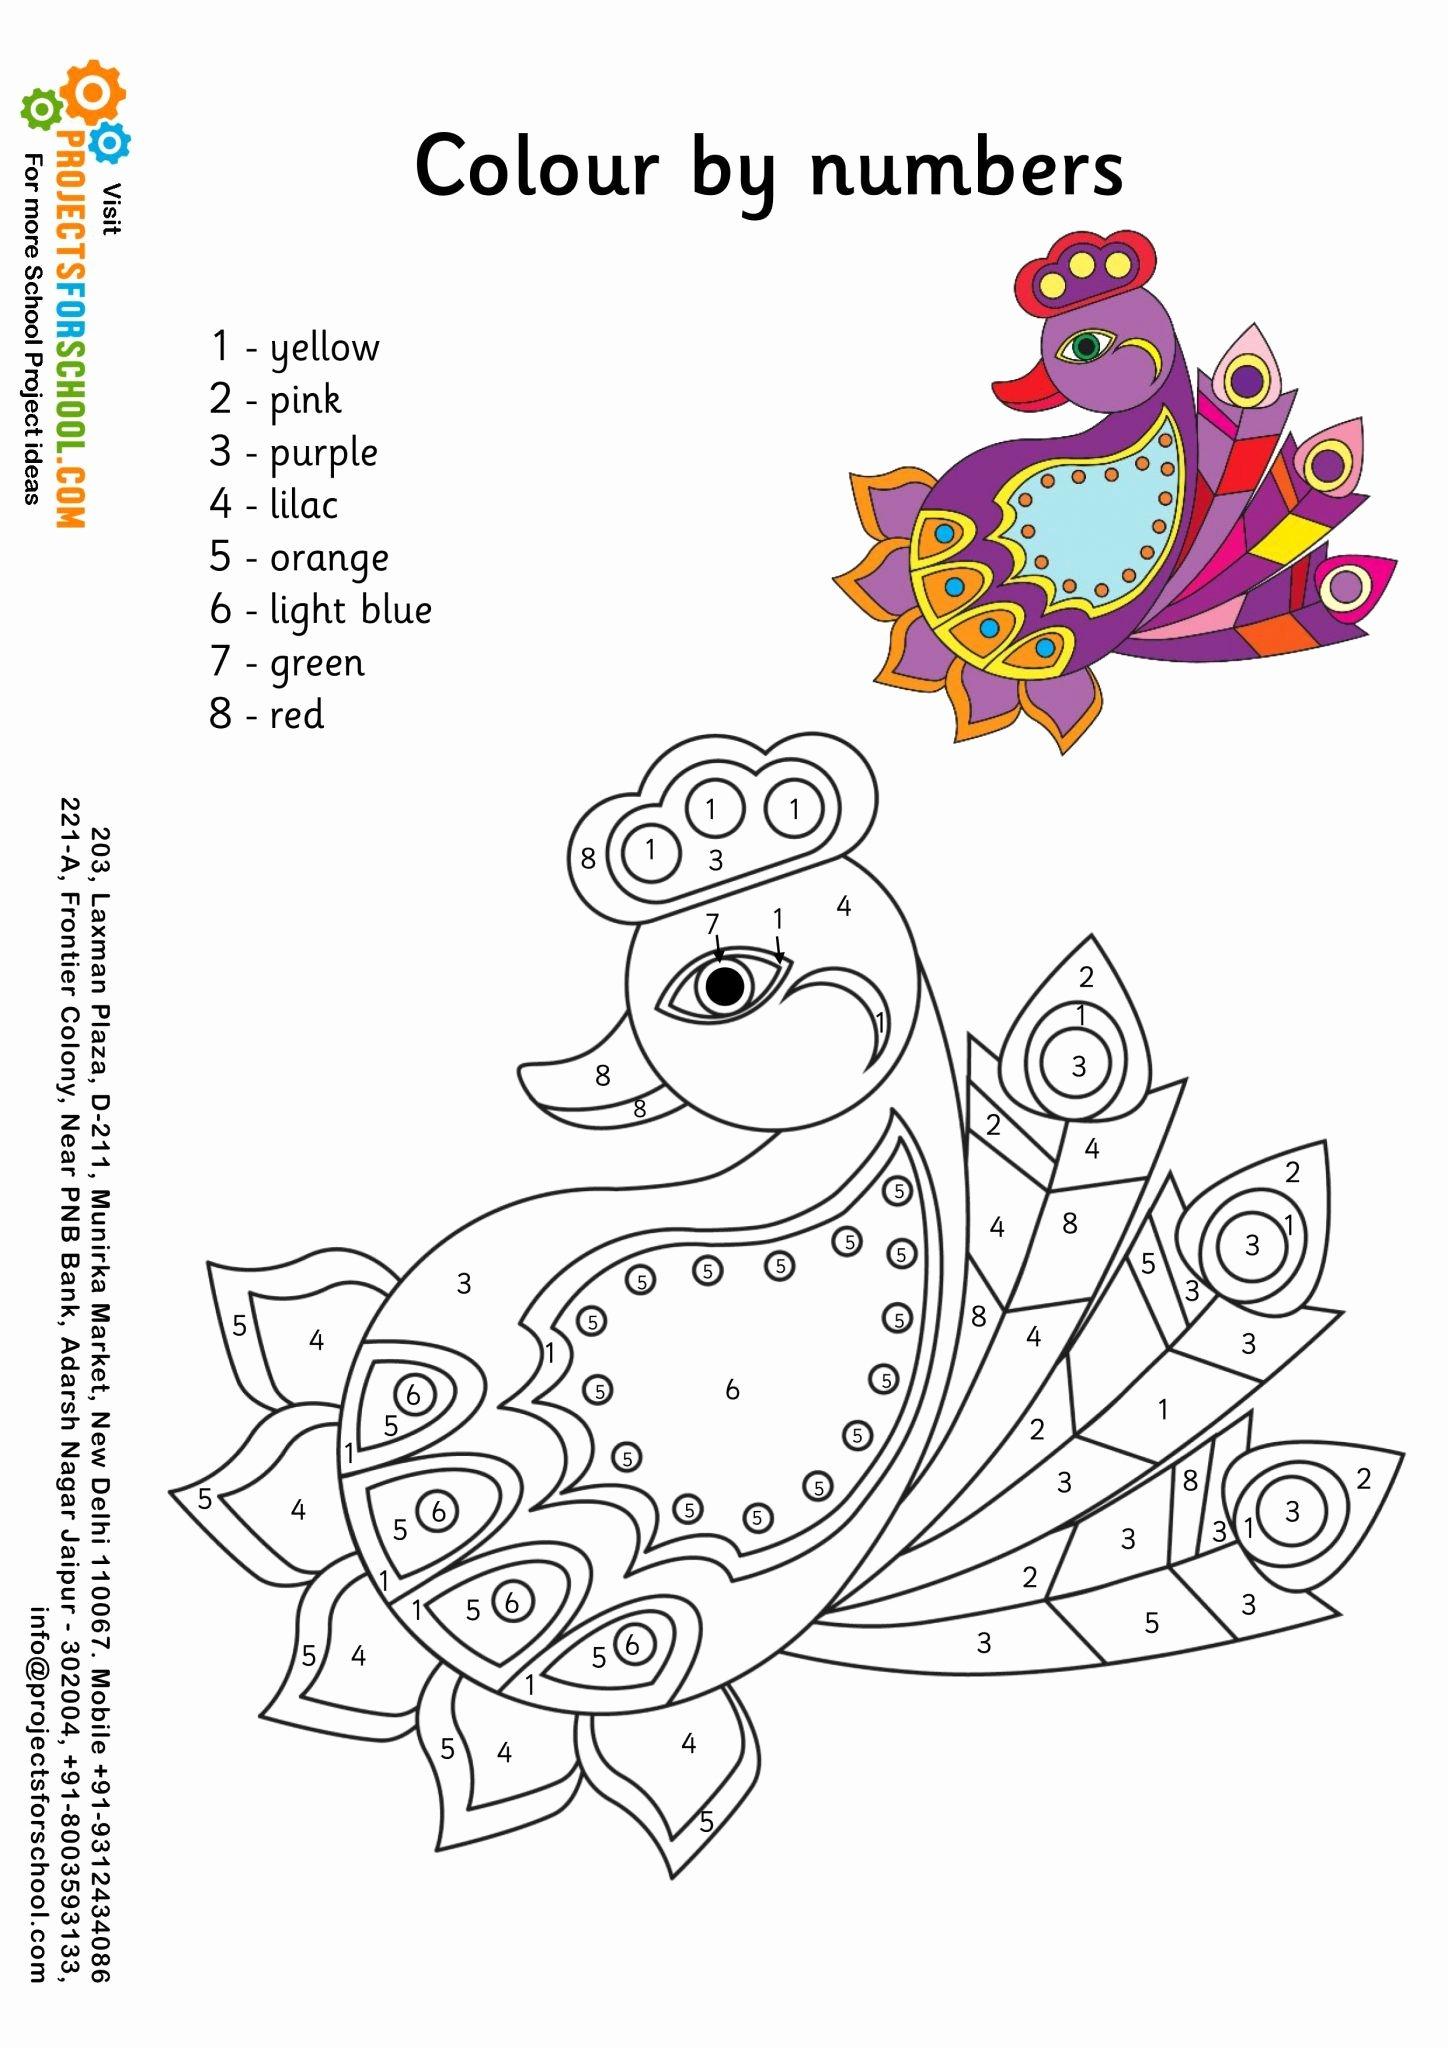 Diwali Worksheets for Preschoolers New Kids Science Projects Rangoli Worksheet 2 Free